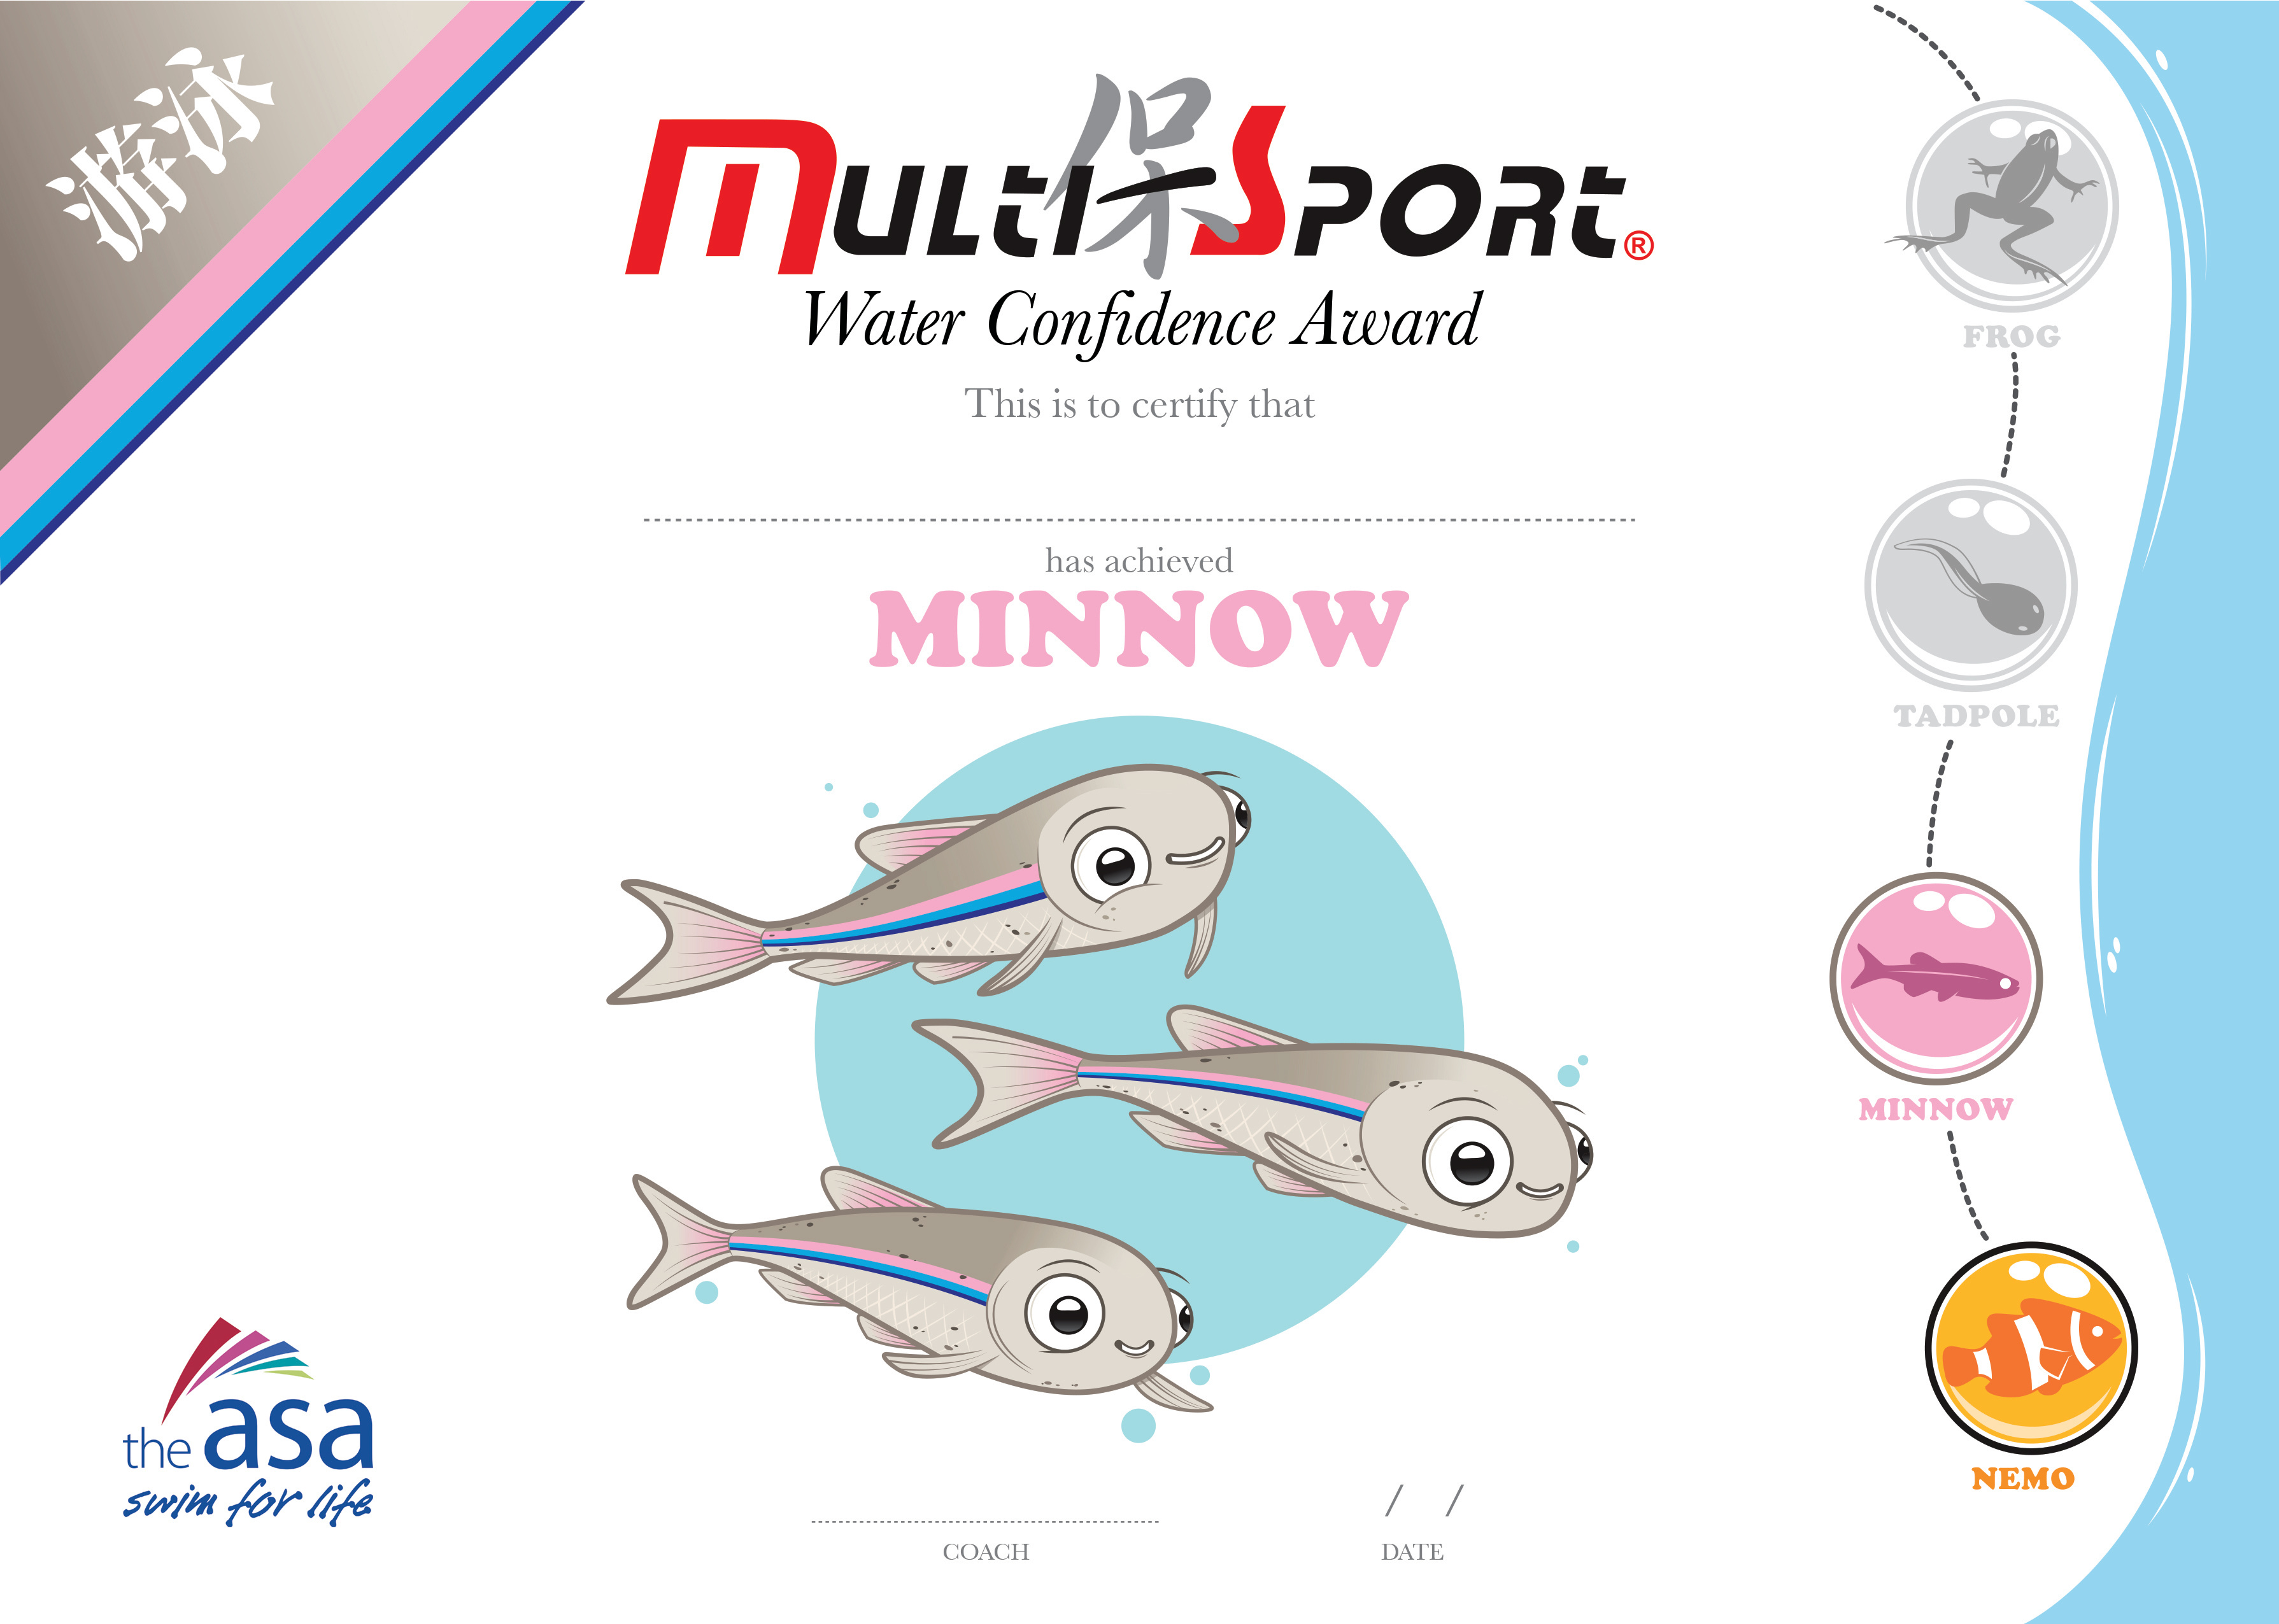 MULTISPORT(minnow)